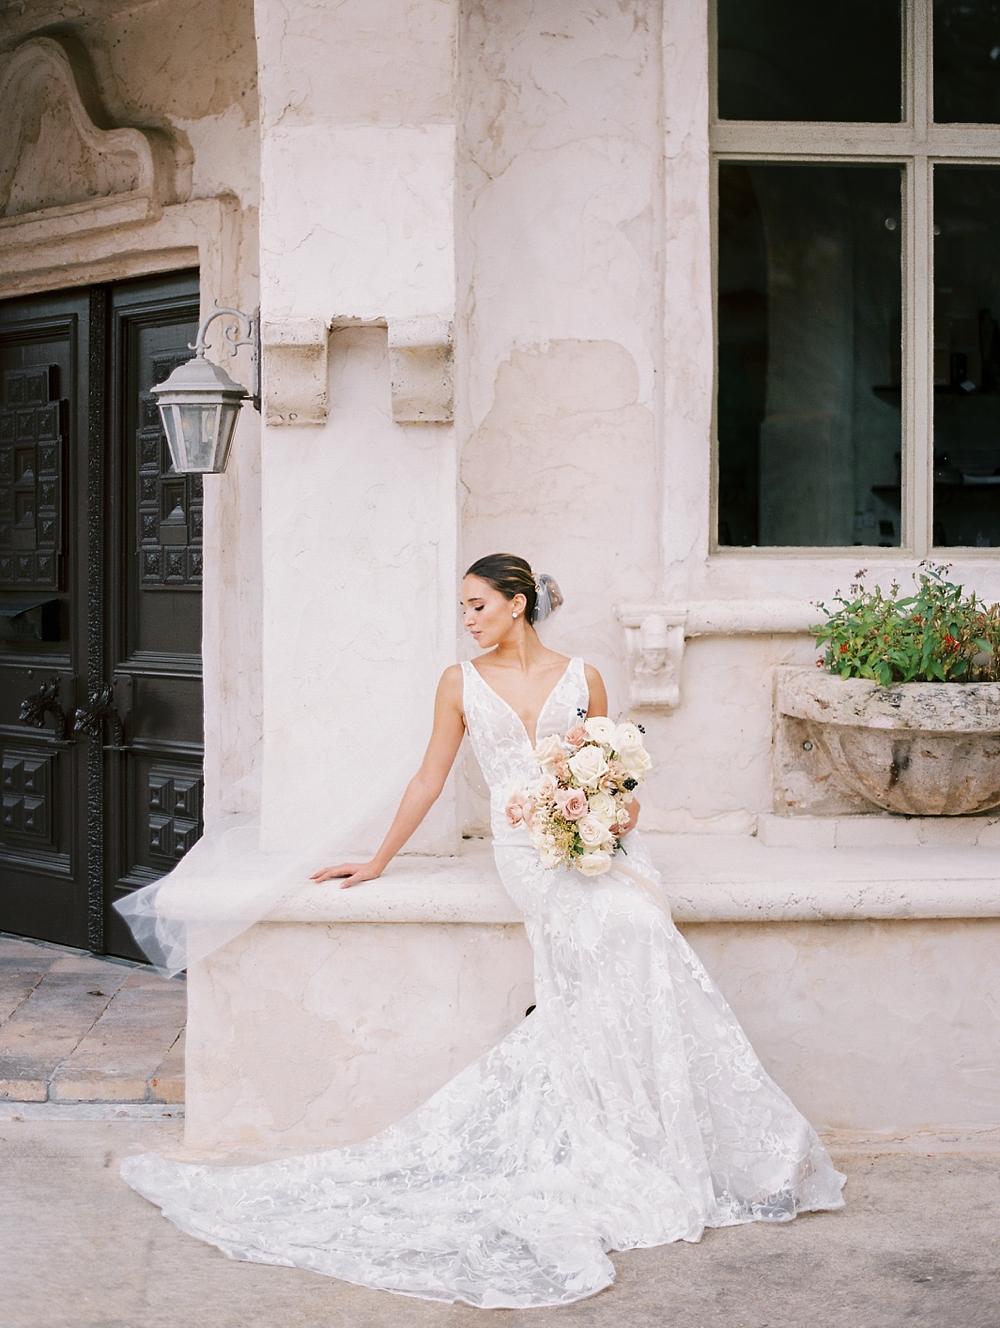 kristin-la-voie-photography-Austin-Wedding-Photographer-Villa-Antonia-328